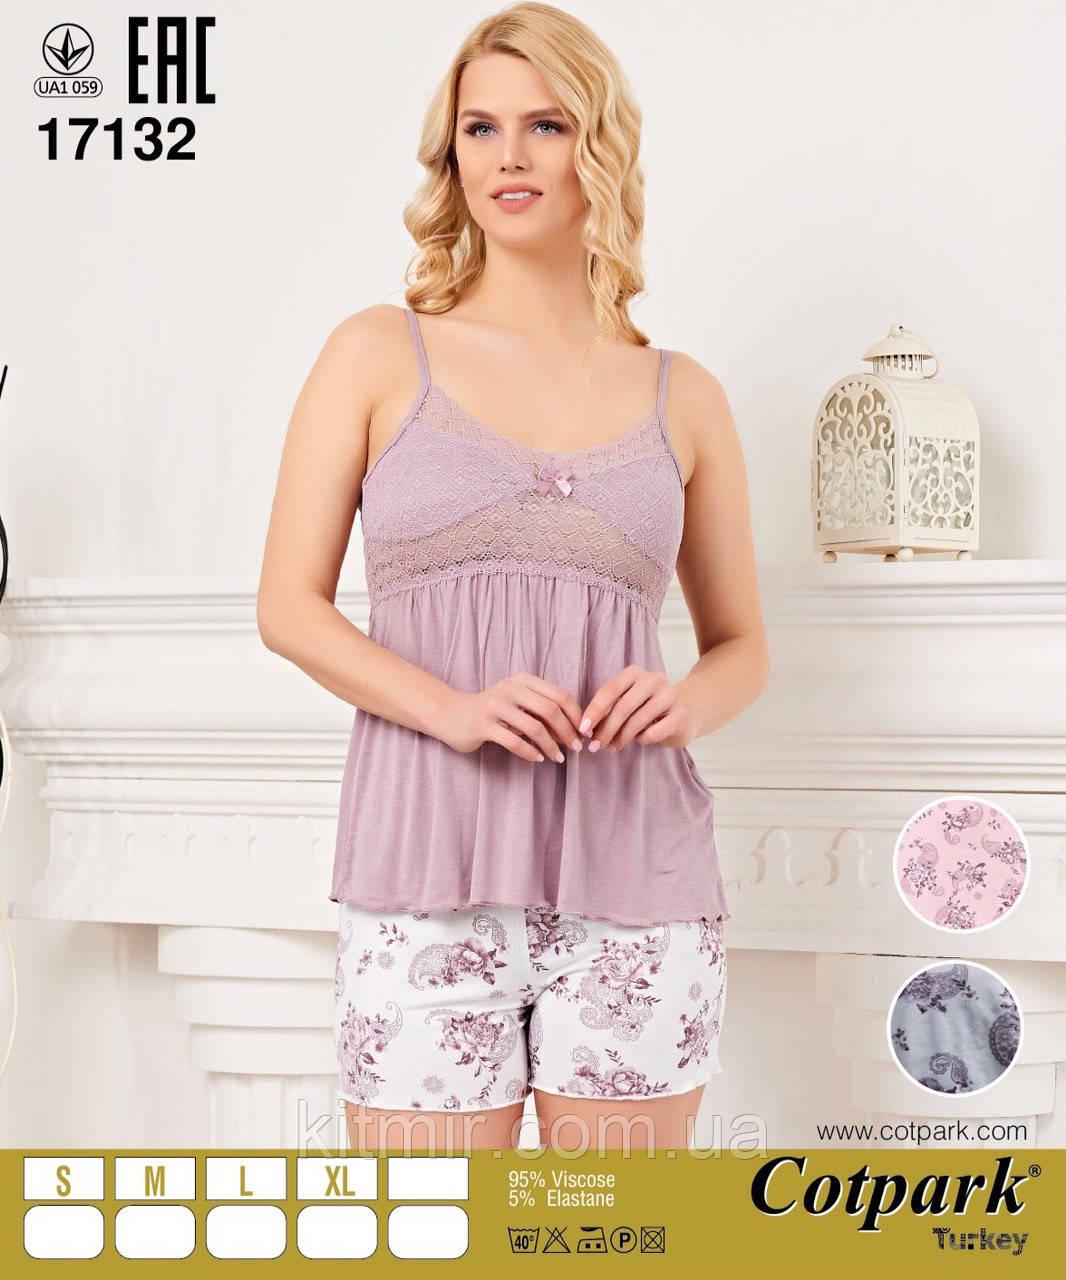 d44636325d64 Пижама женская Cotpark с S до XL